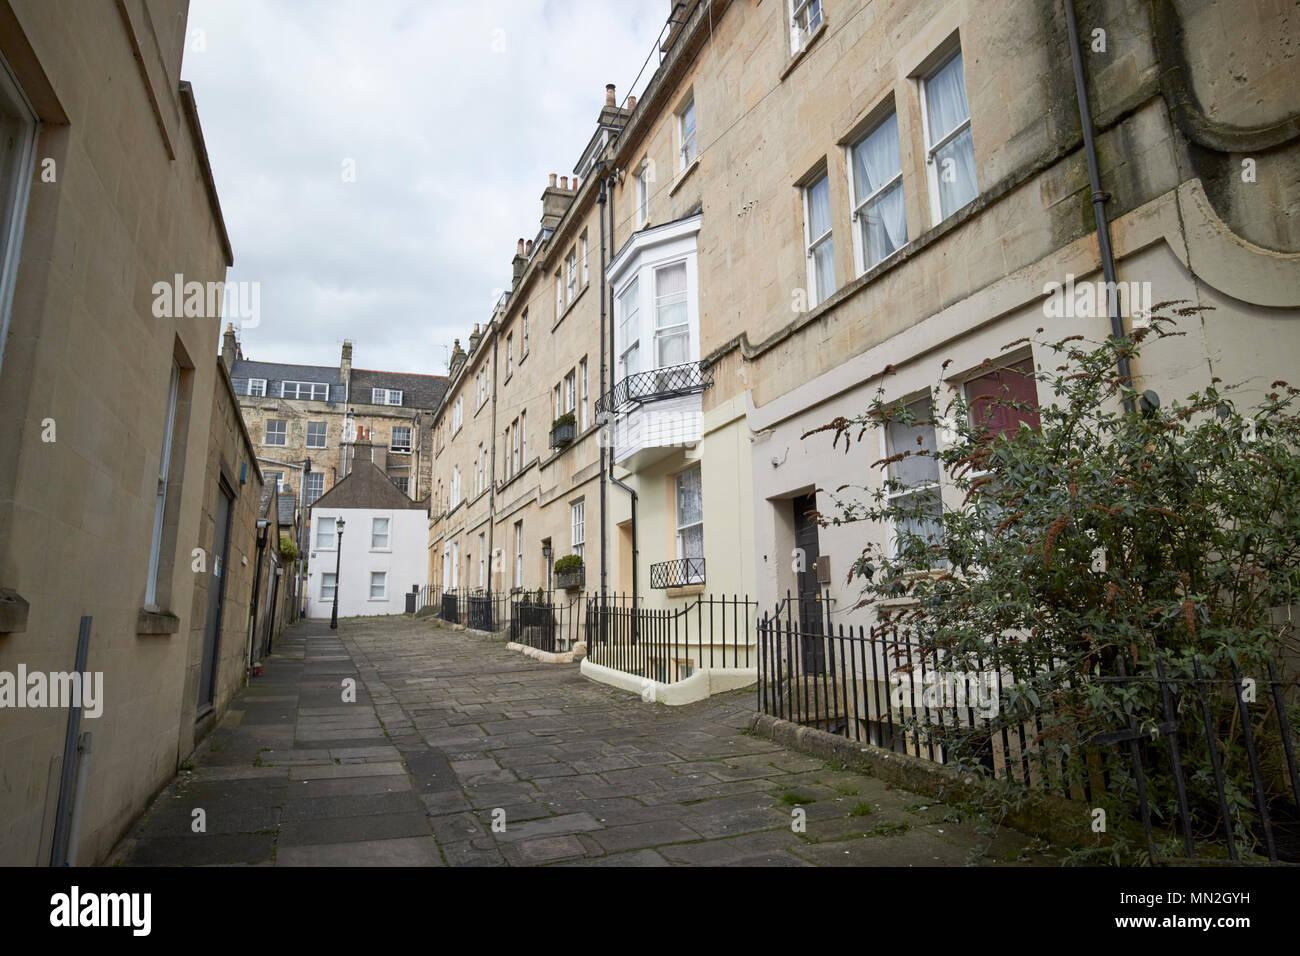 Barton Buildings terrace of seven georgian limestone houses forming a cul de sac Bath England UK - Stock Image